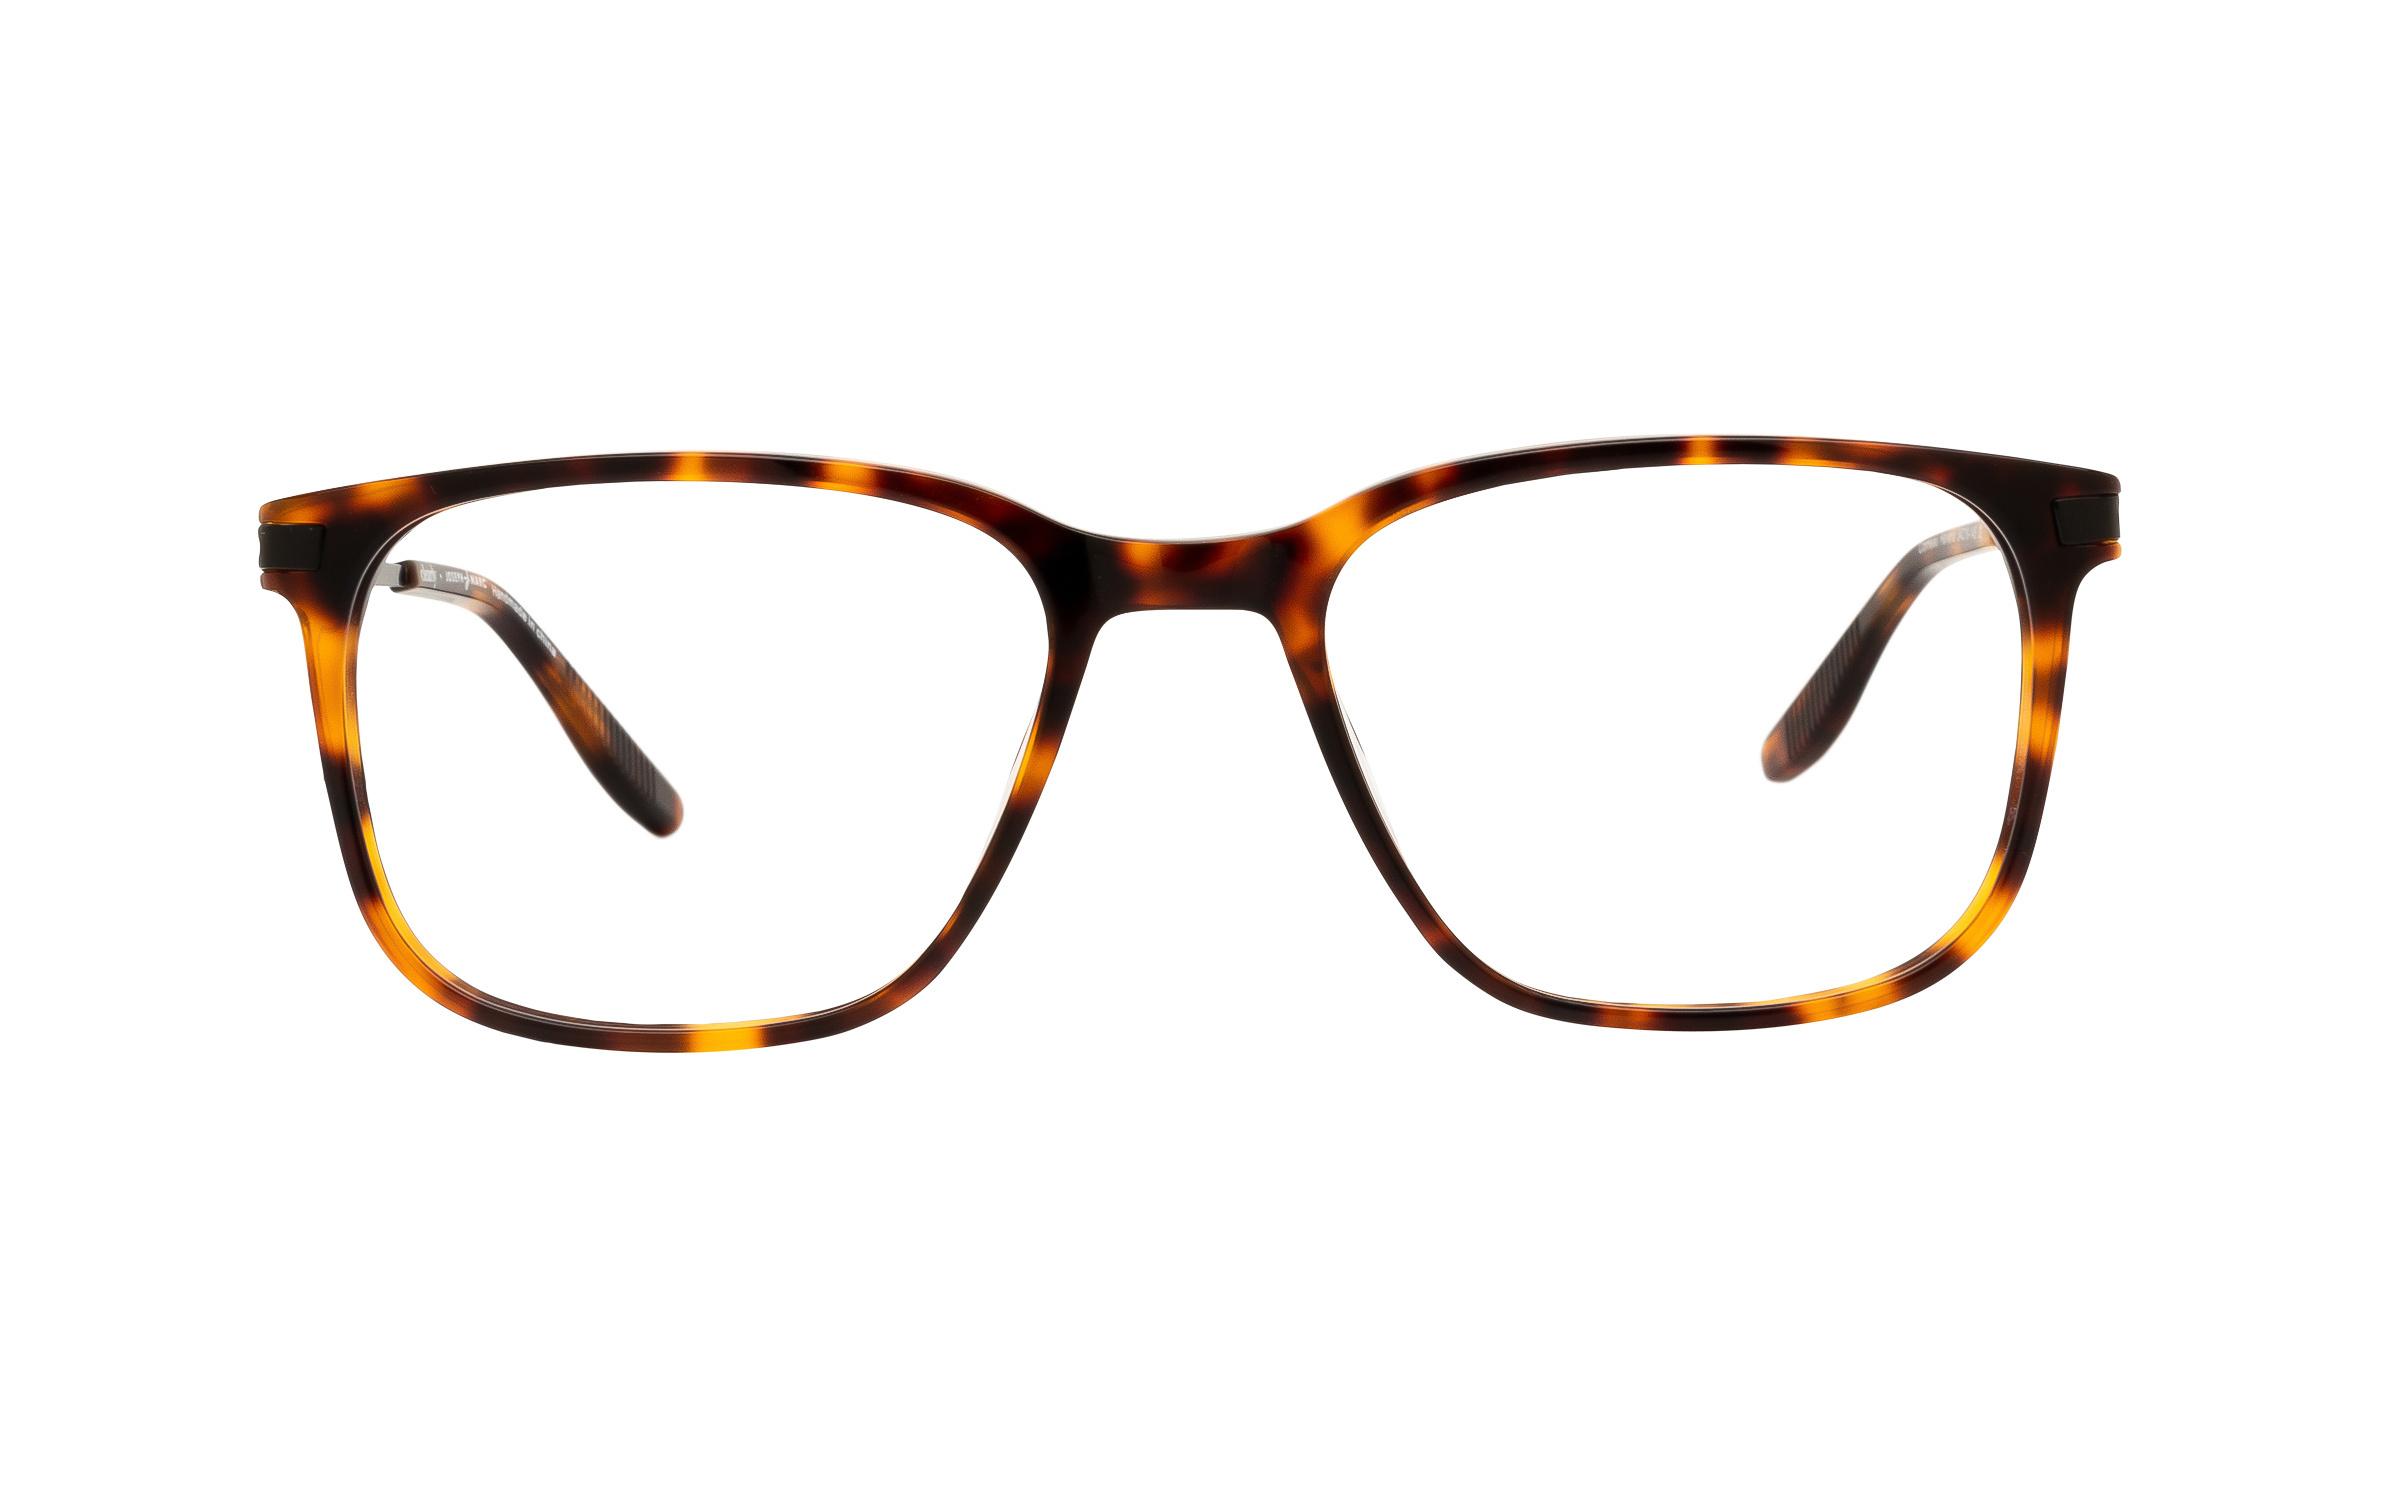 Joseph Marc Comeau JM062 C01 (54) Eyeglasses and Frame in Havana Tortoise | Acetate/Plastic/Metal